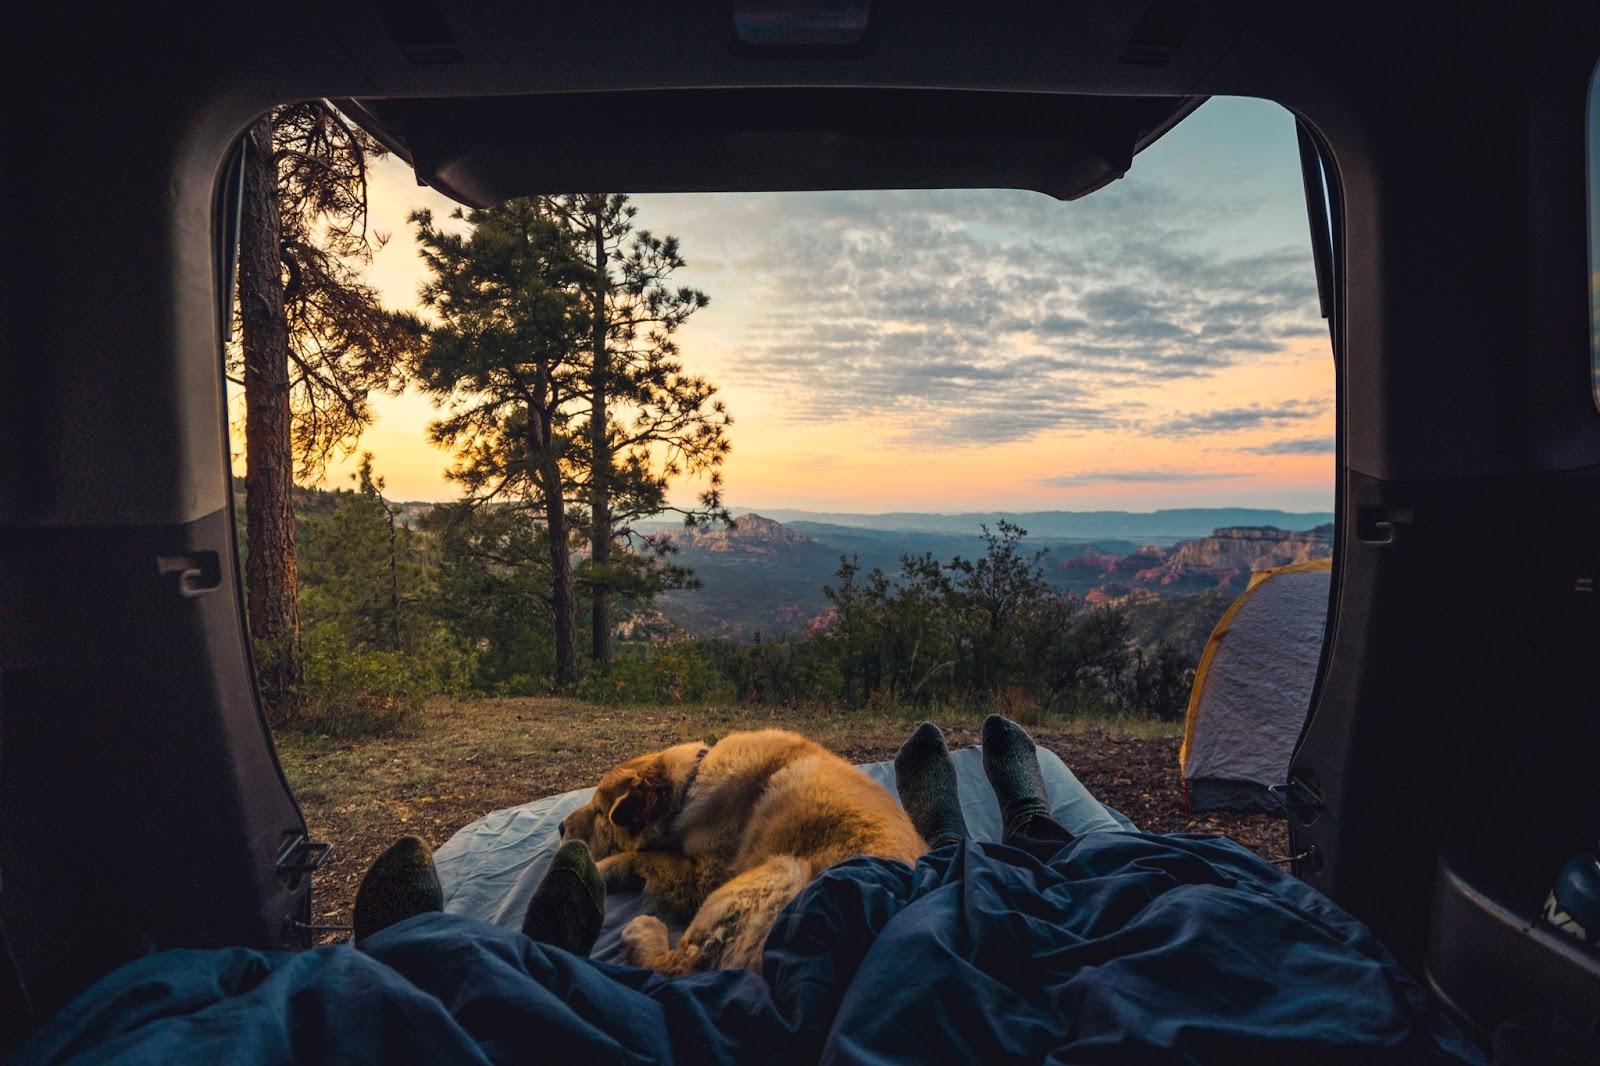 camping newly-wed activity